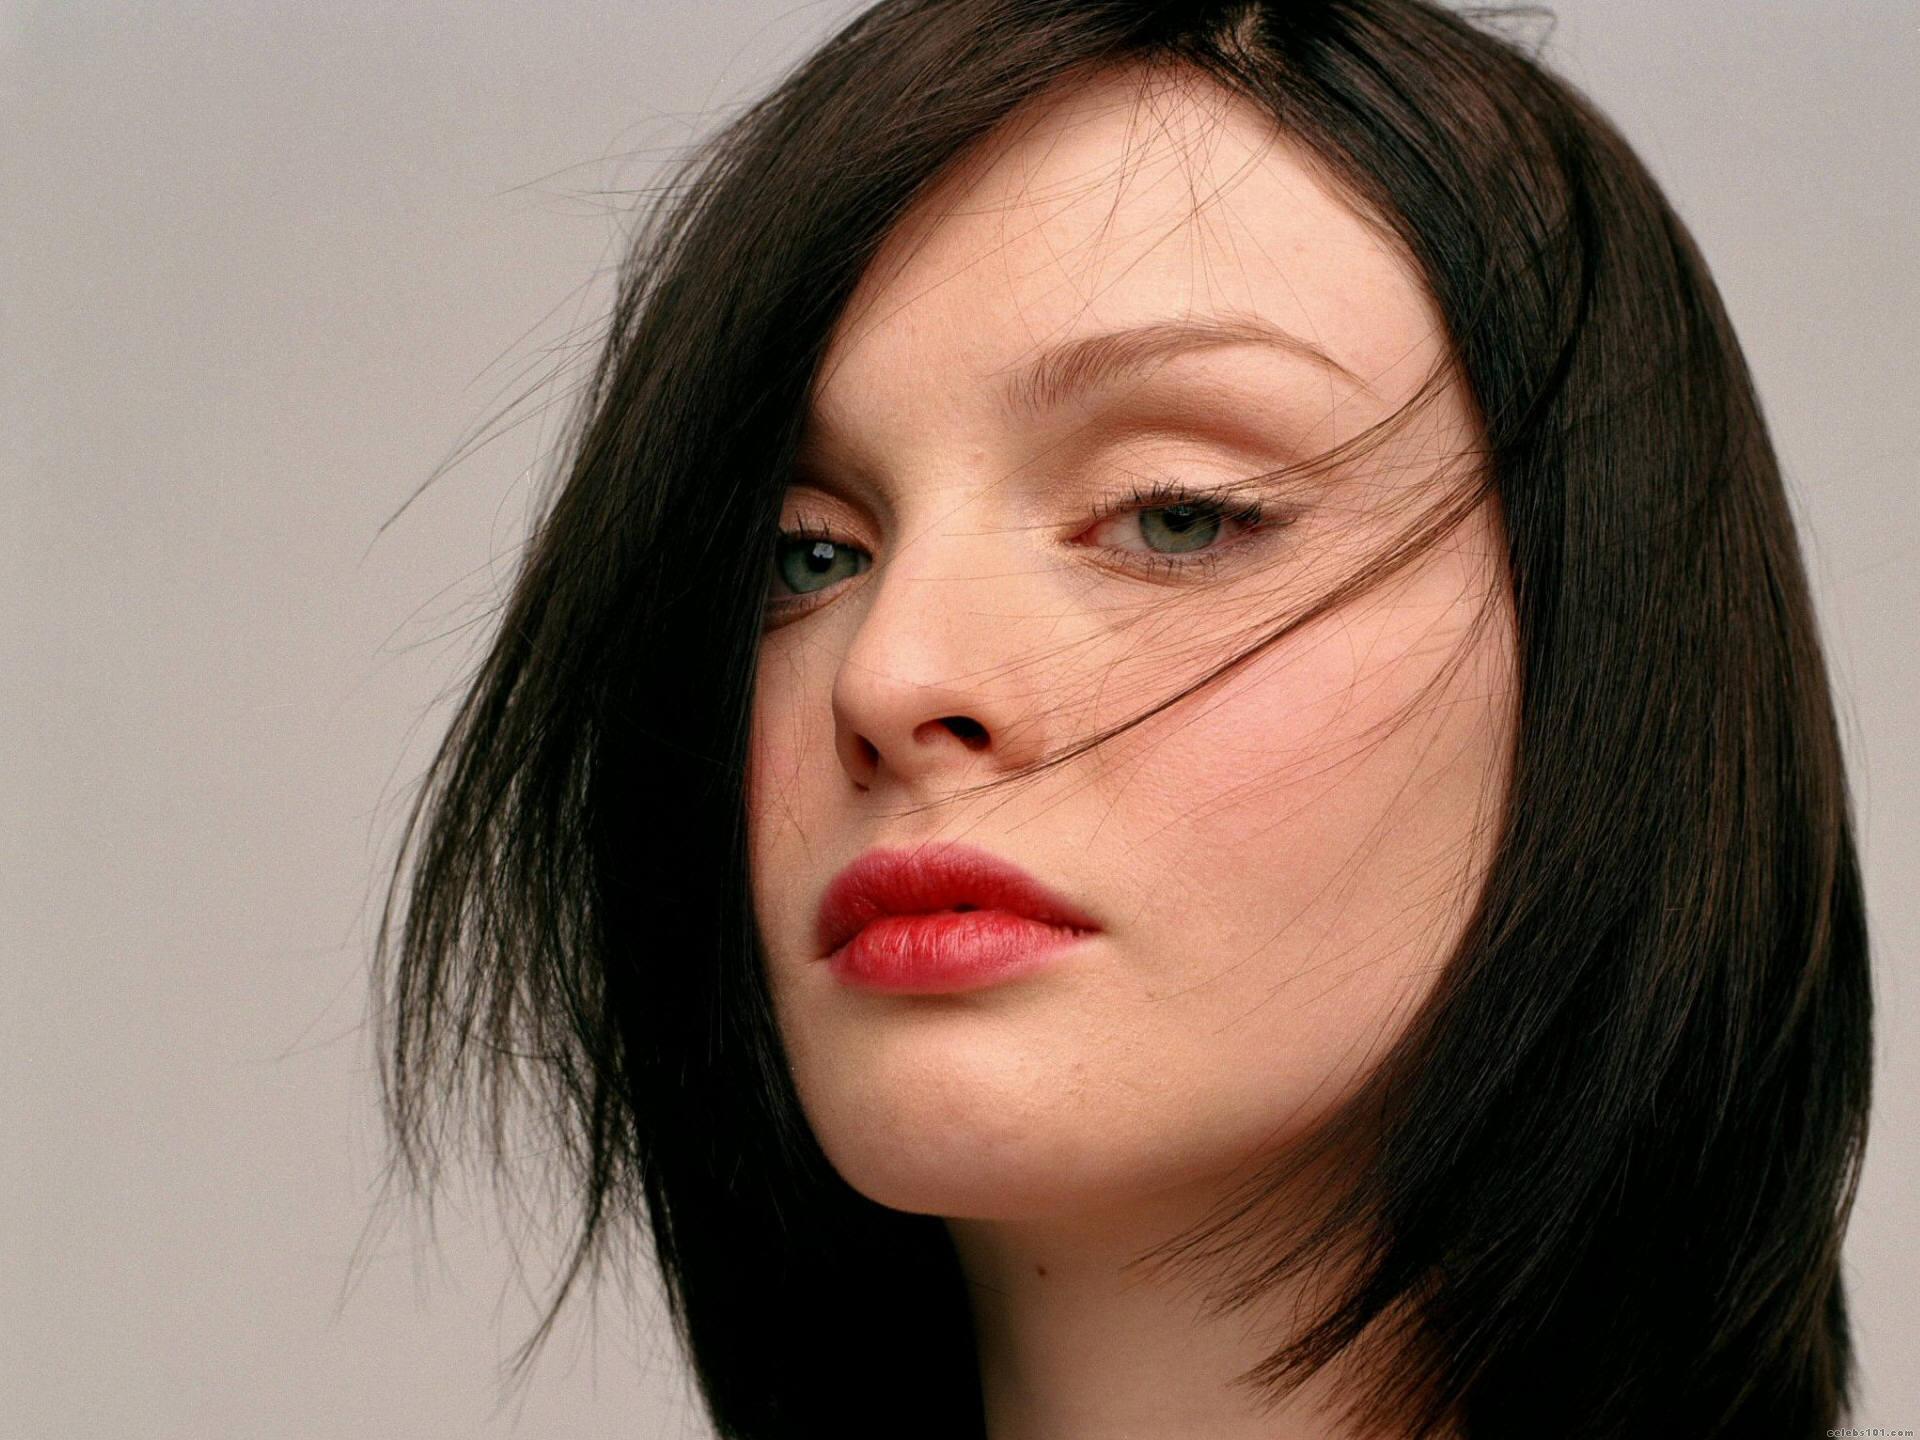 Sophie Ellis-Bextor - Images Colection